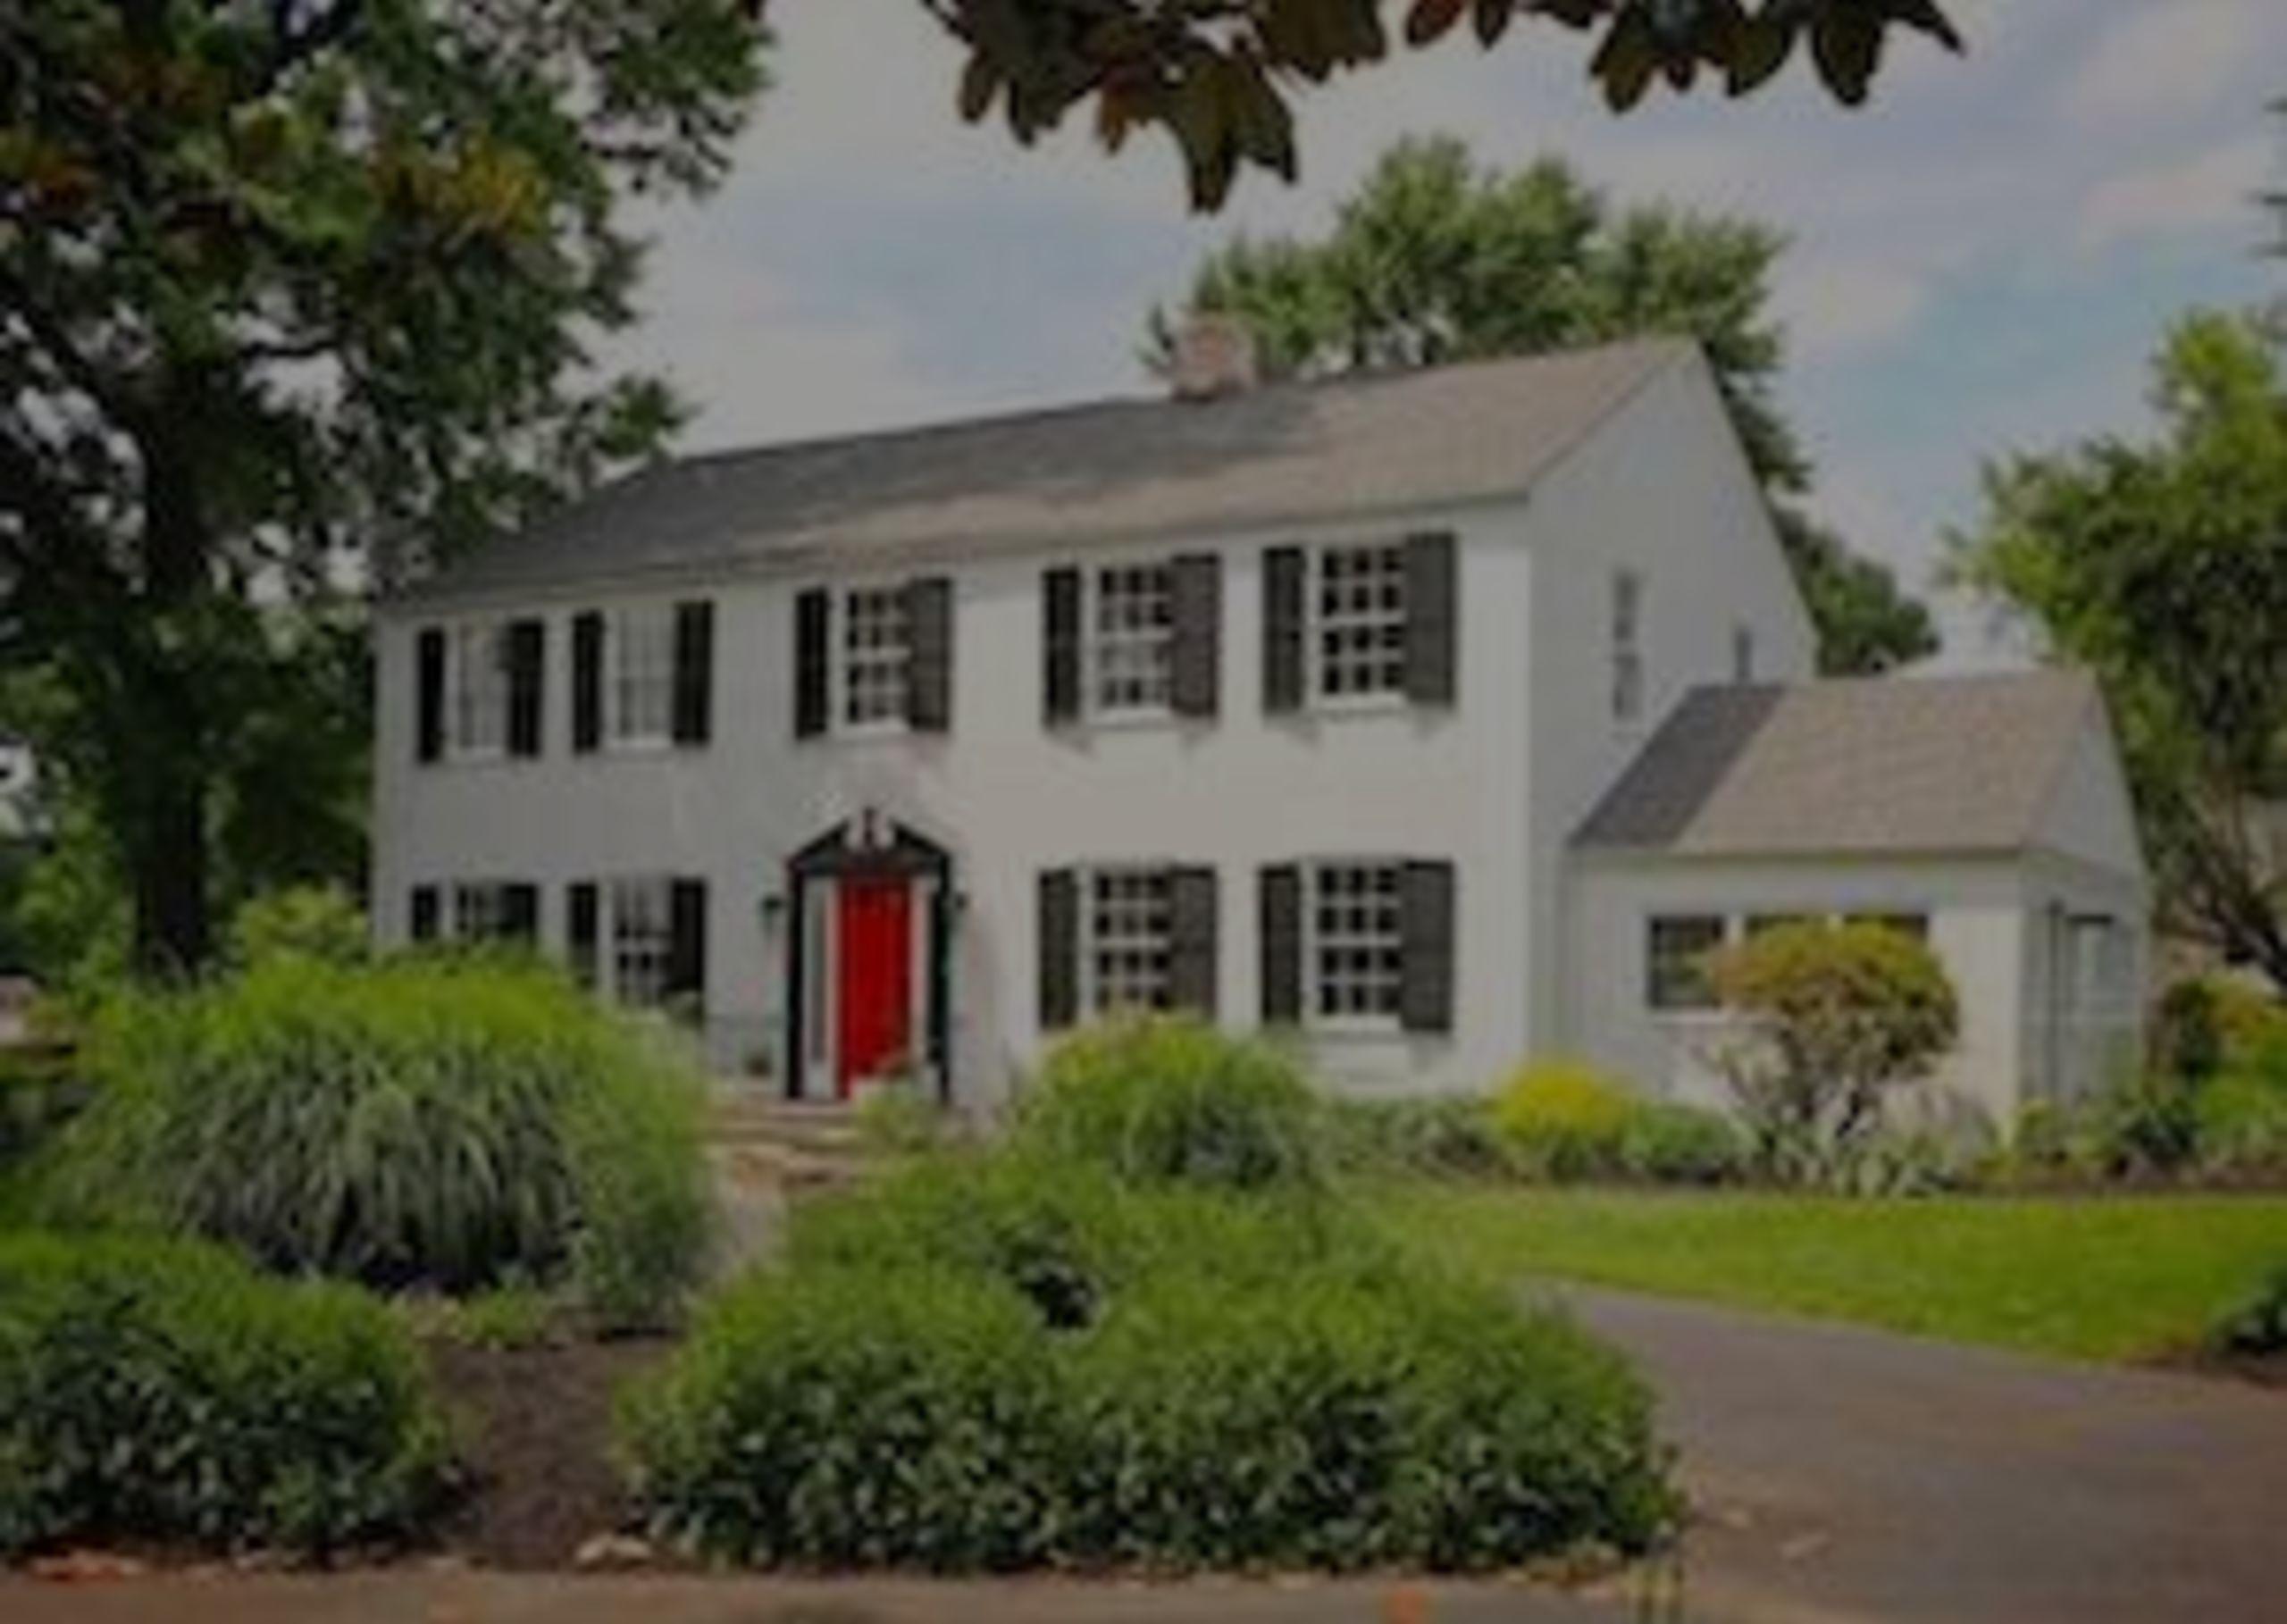 Open Houses | 7/8 + 7/9 in Loudoun, Clarke & Frederick